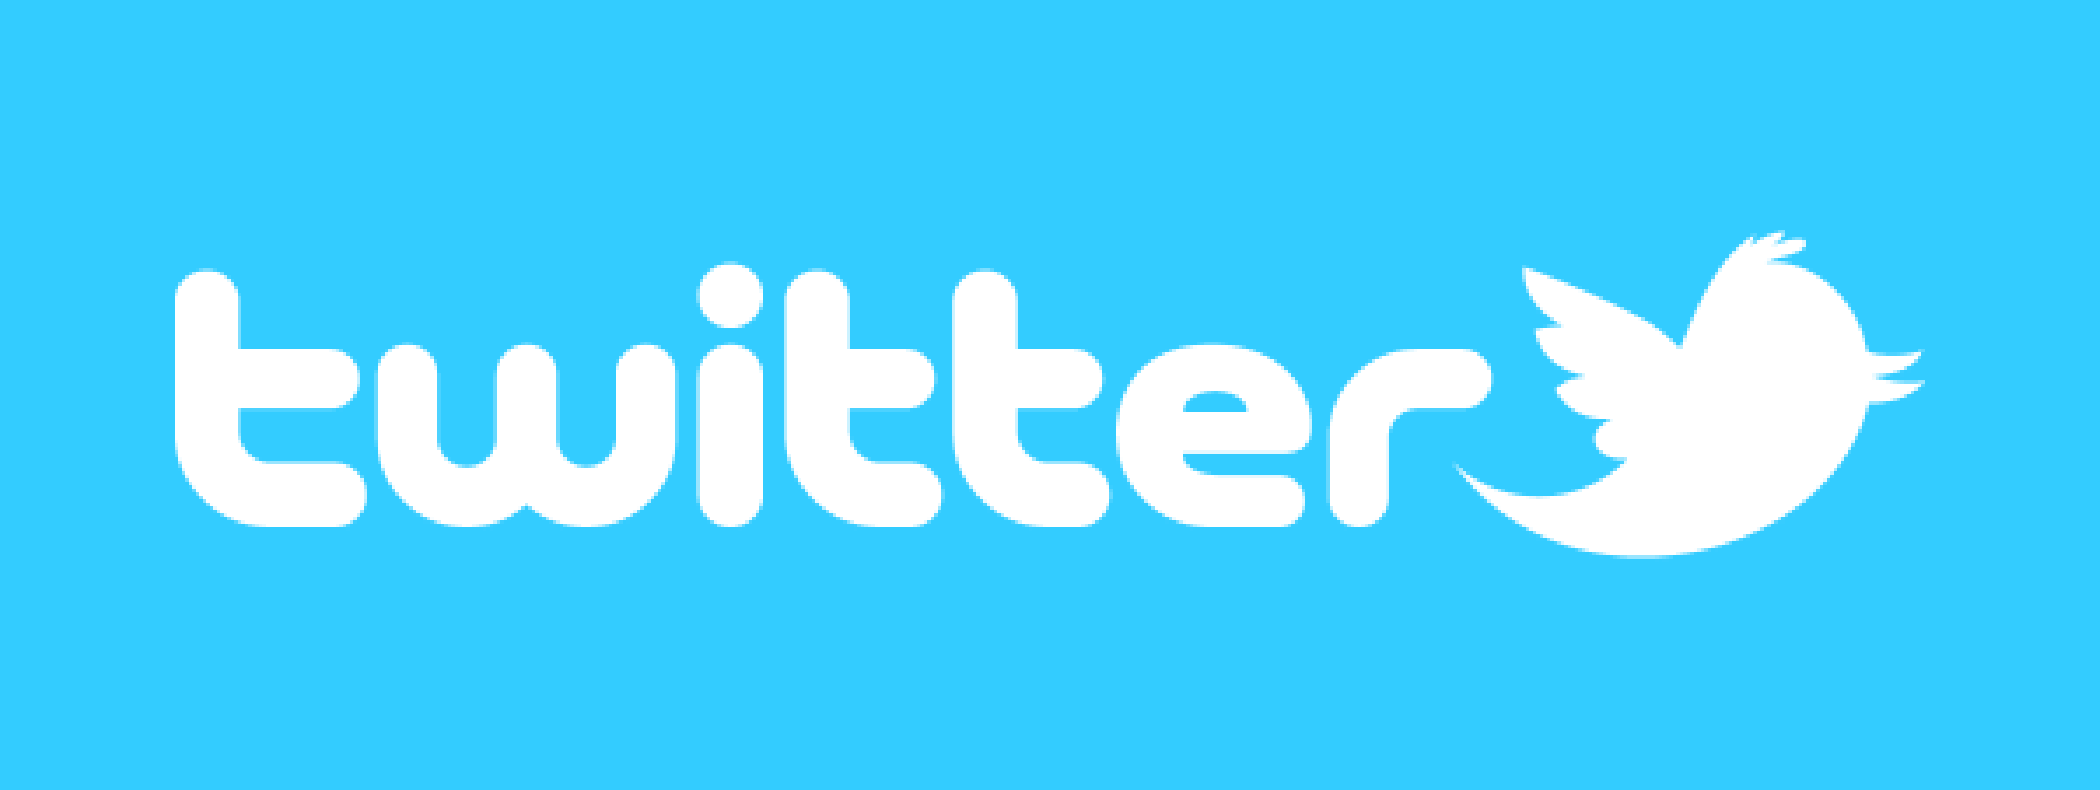 twitter-logo - Villa Maria Pia